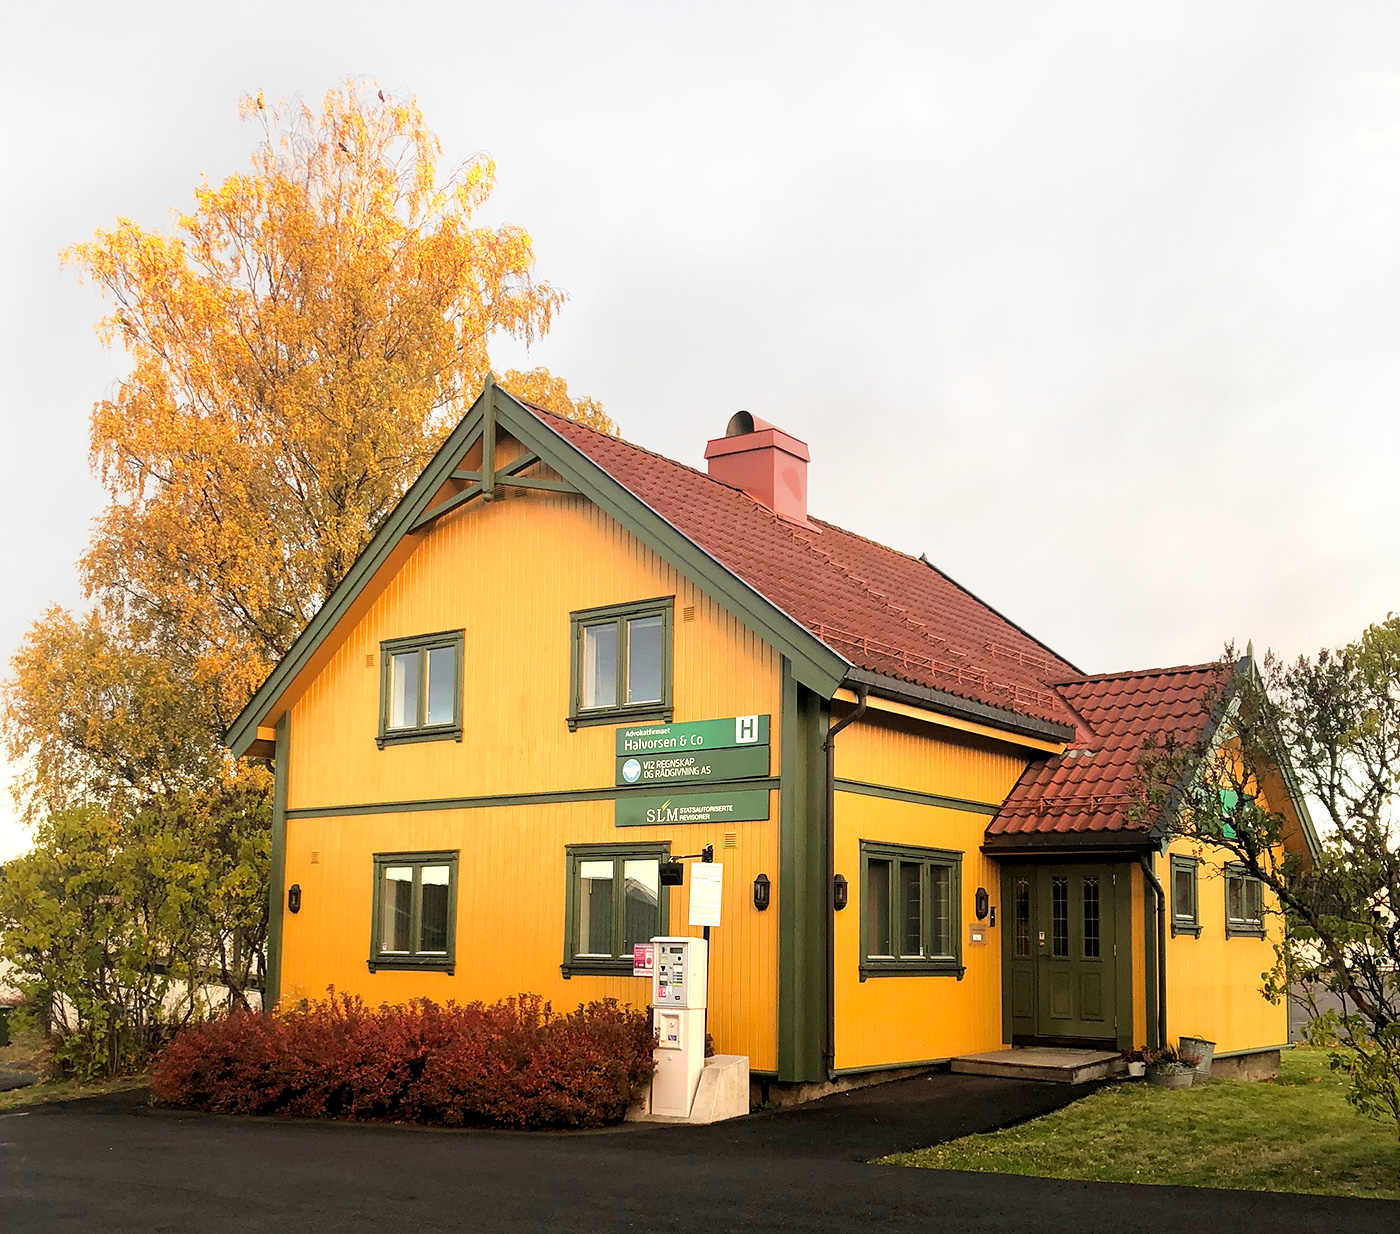 Jessheim-kontor åpnet